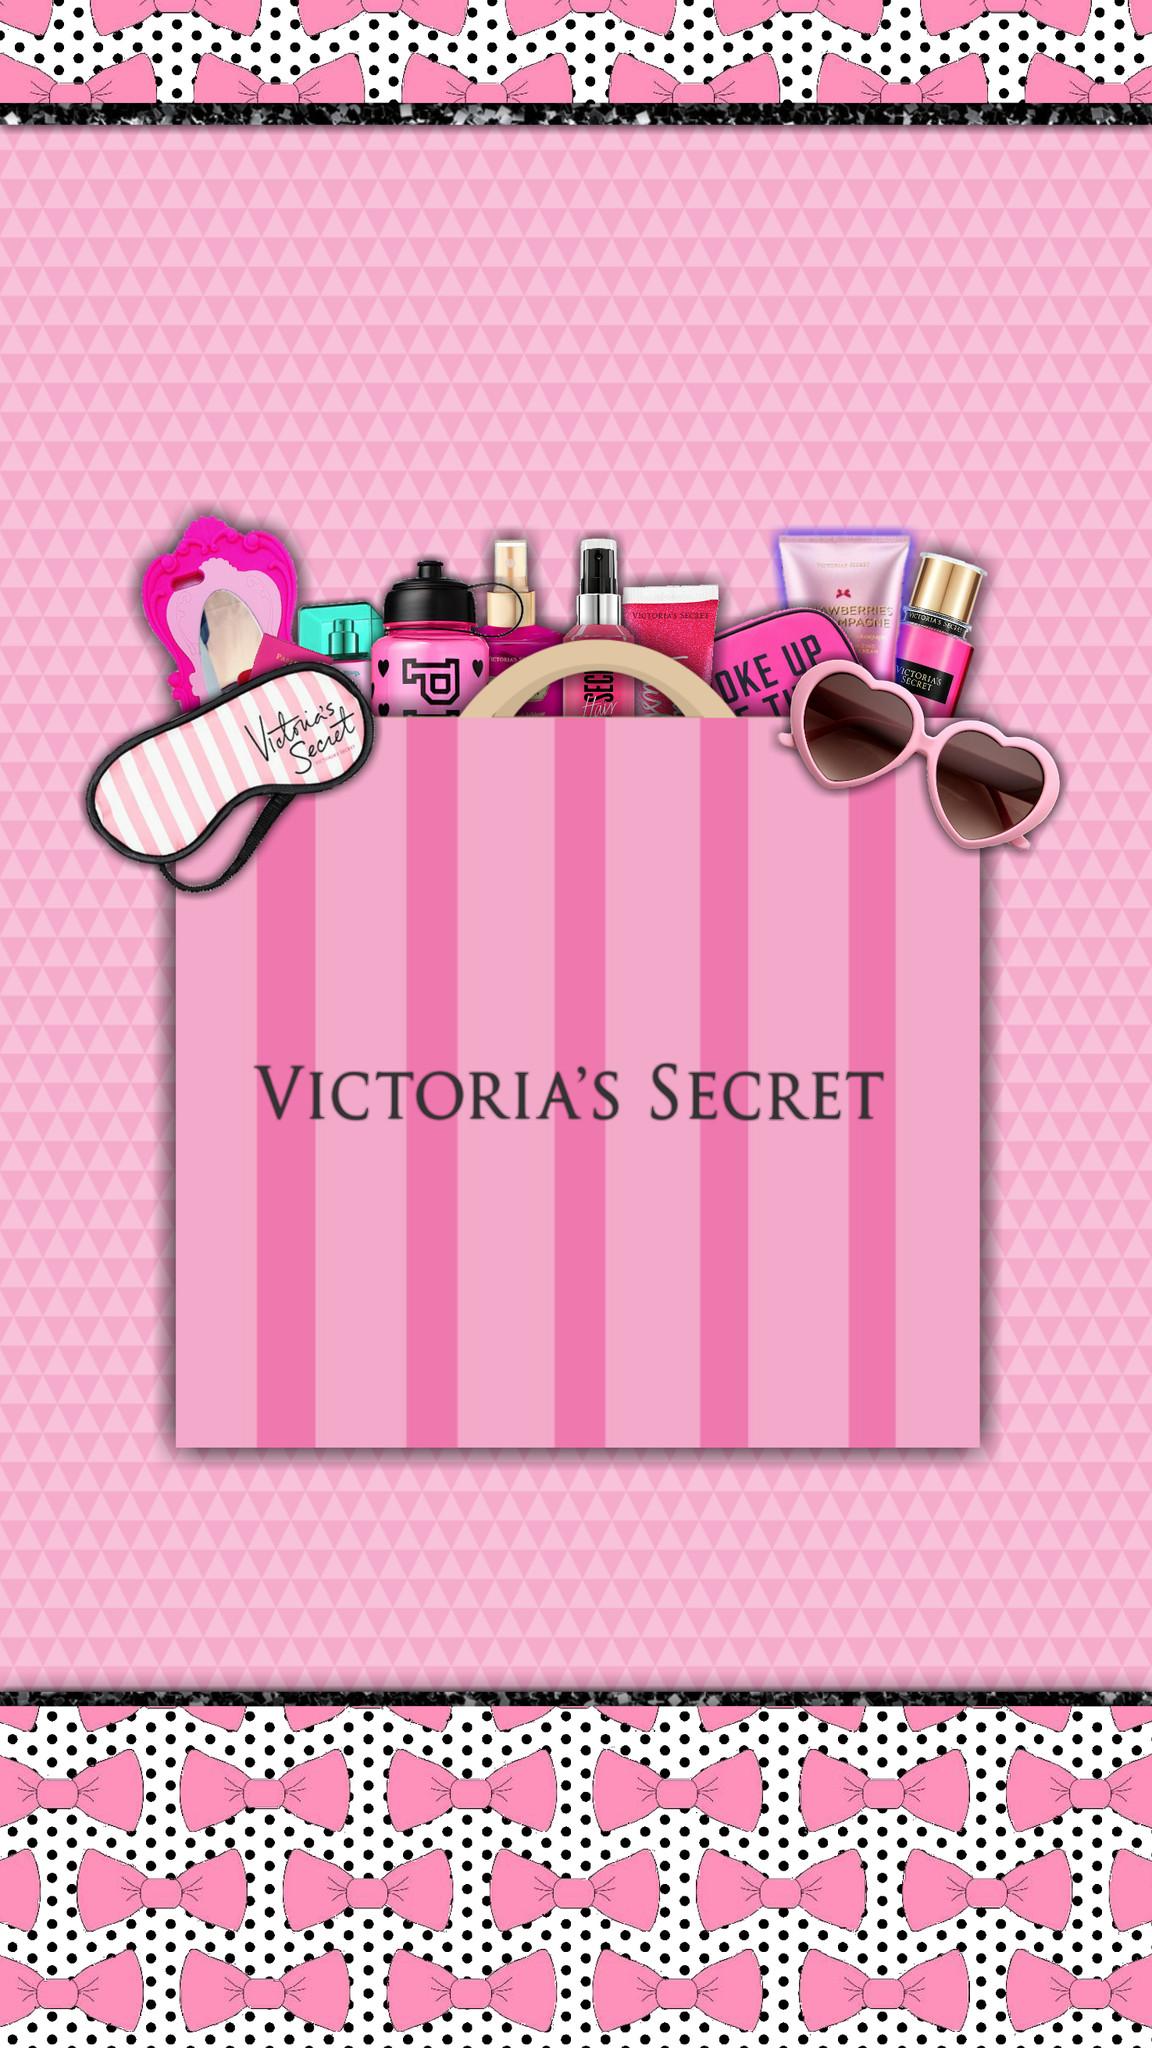 Dropbox – Totally pink. Vs PinkPhone WallpapersVictoria's SecretIphone …